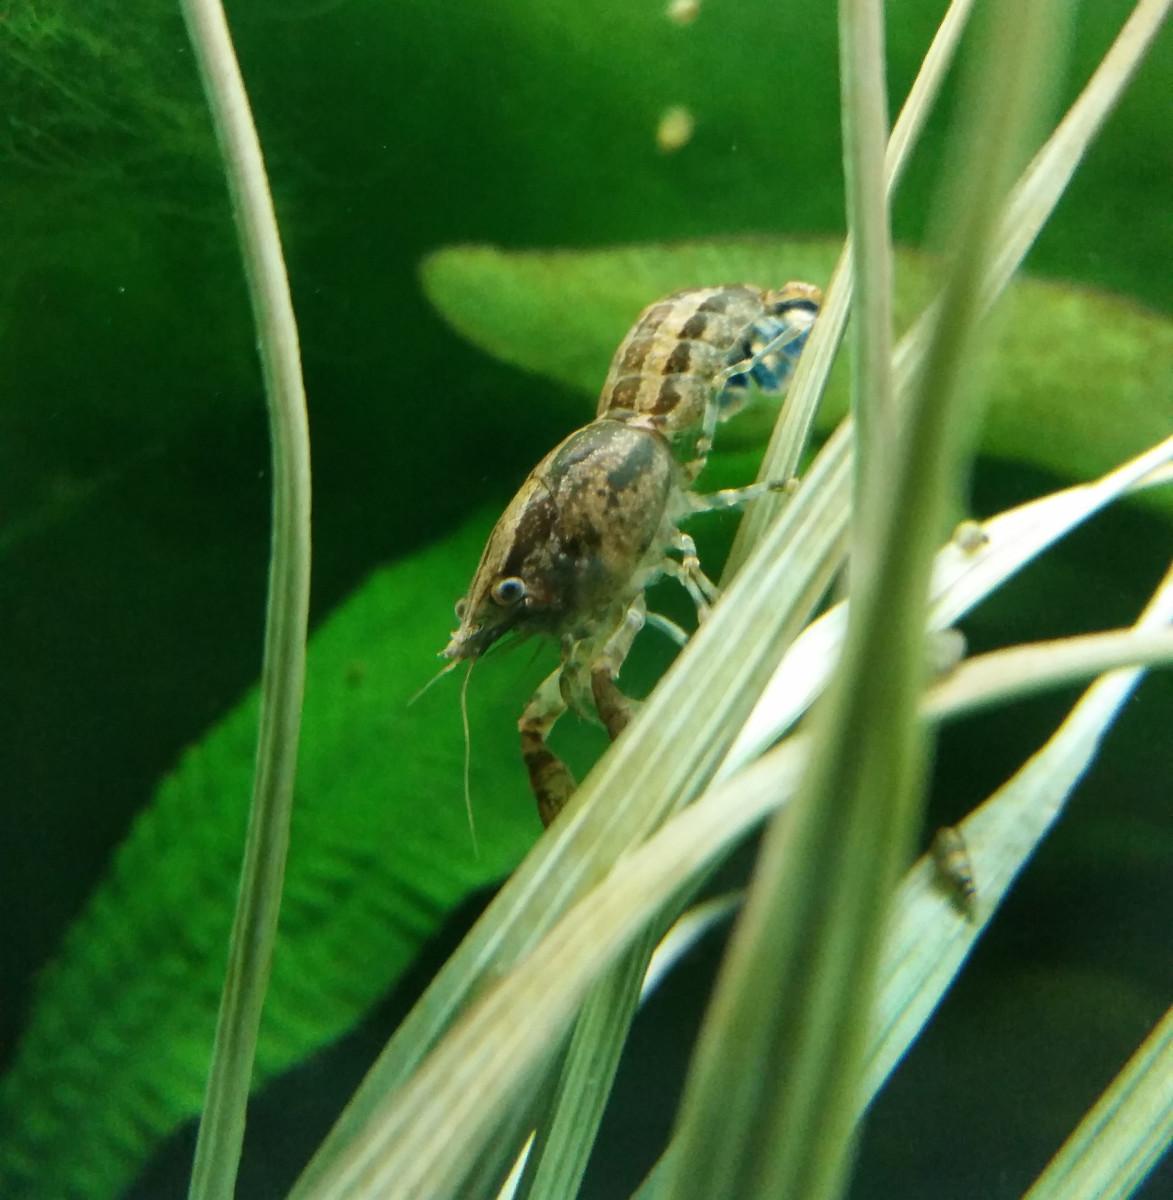 How to Care for Cajun Dwarf Crayfish (Cambarellus shufeldtii)